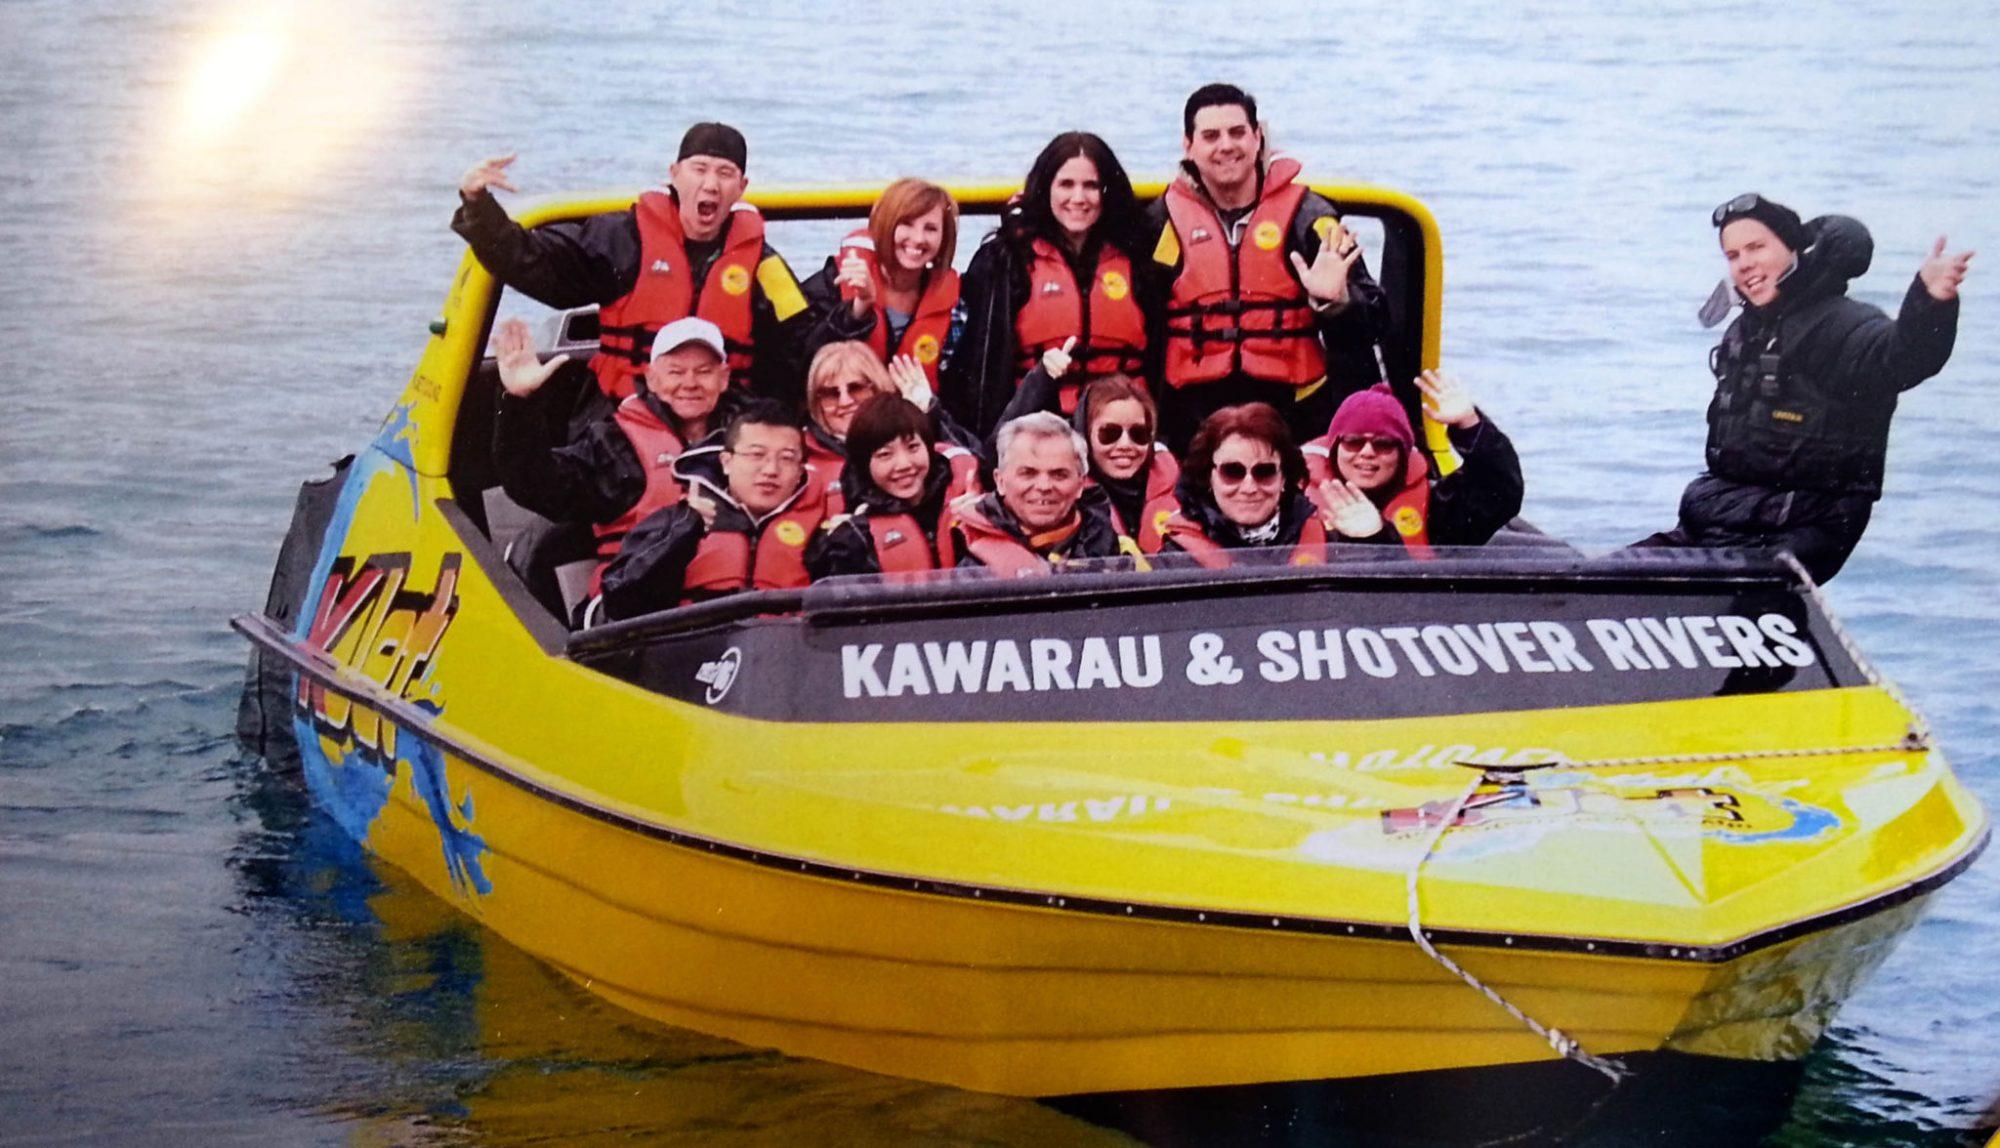 8 Unforgettable things to do in Queenstown New Zealand   KJet jet boat tour #newzealand #queenstown #simplywander